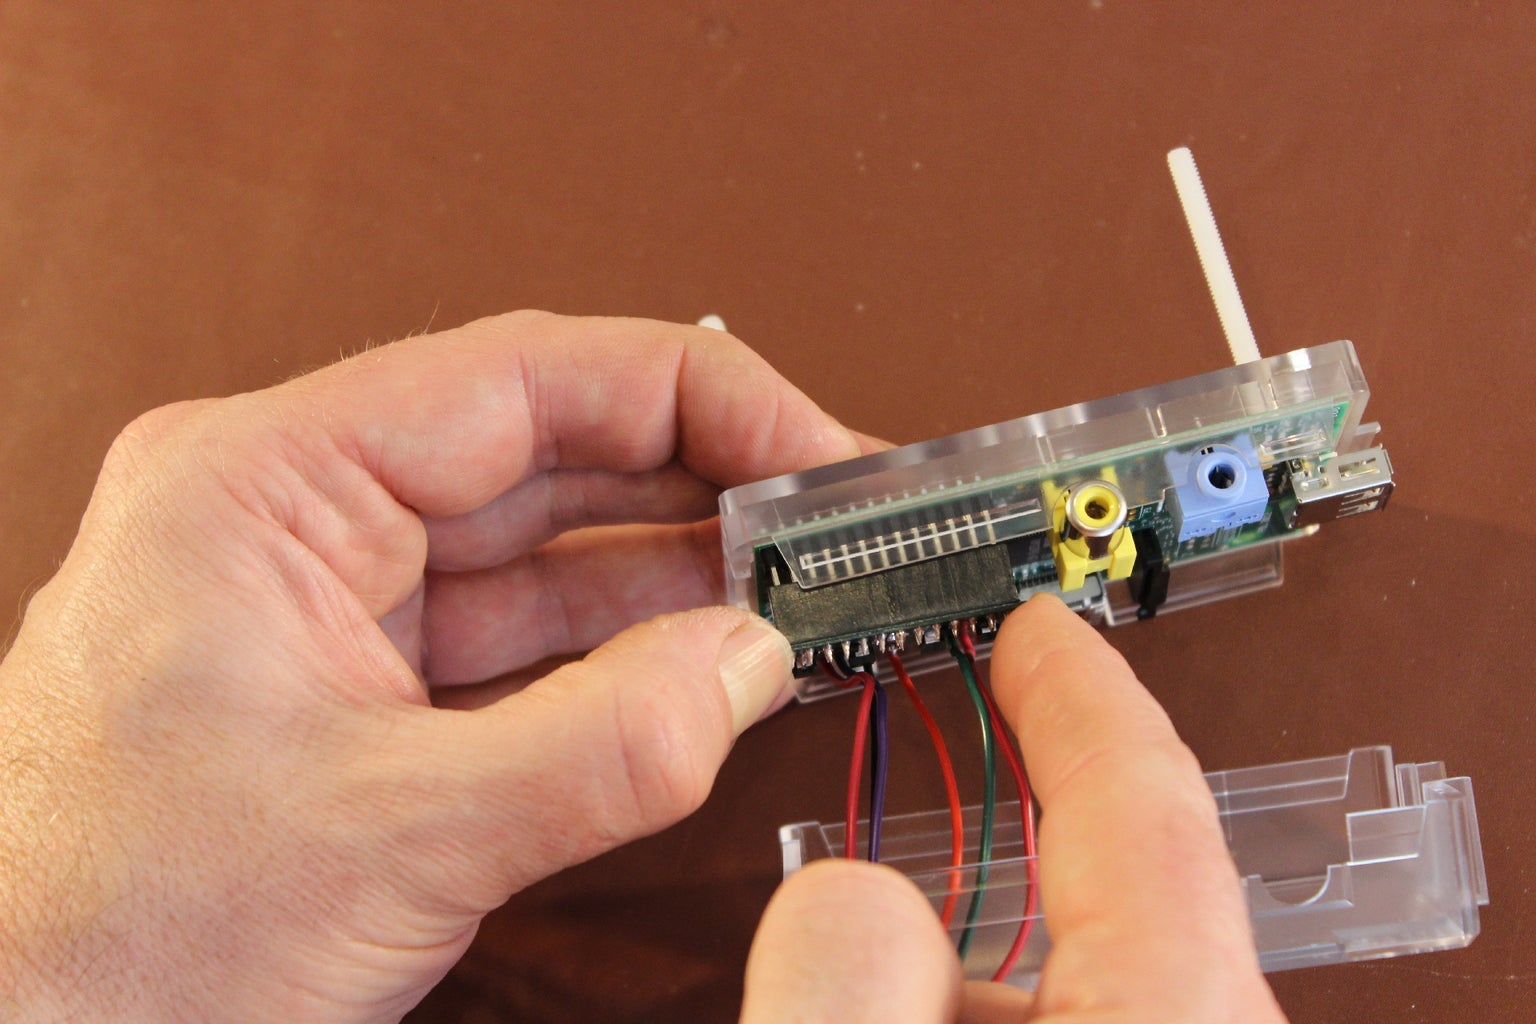 Attach the PicoBorg to the GPIO Pins